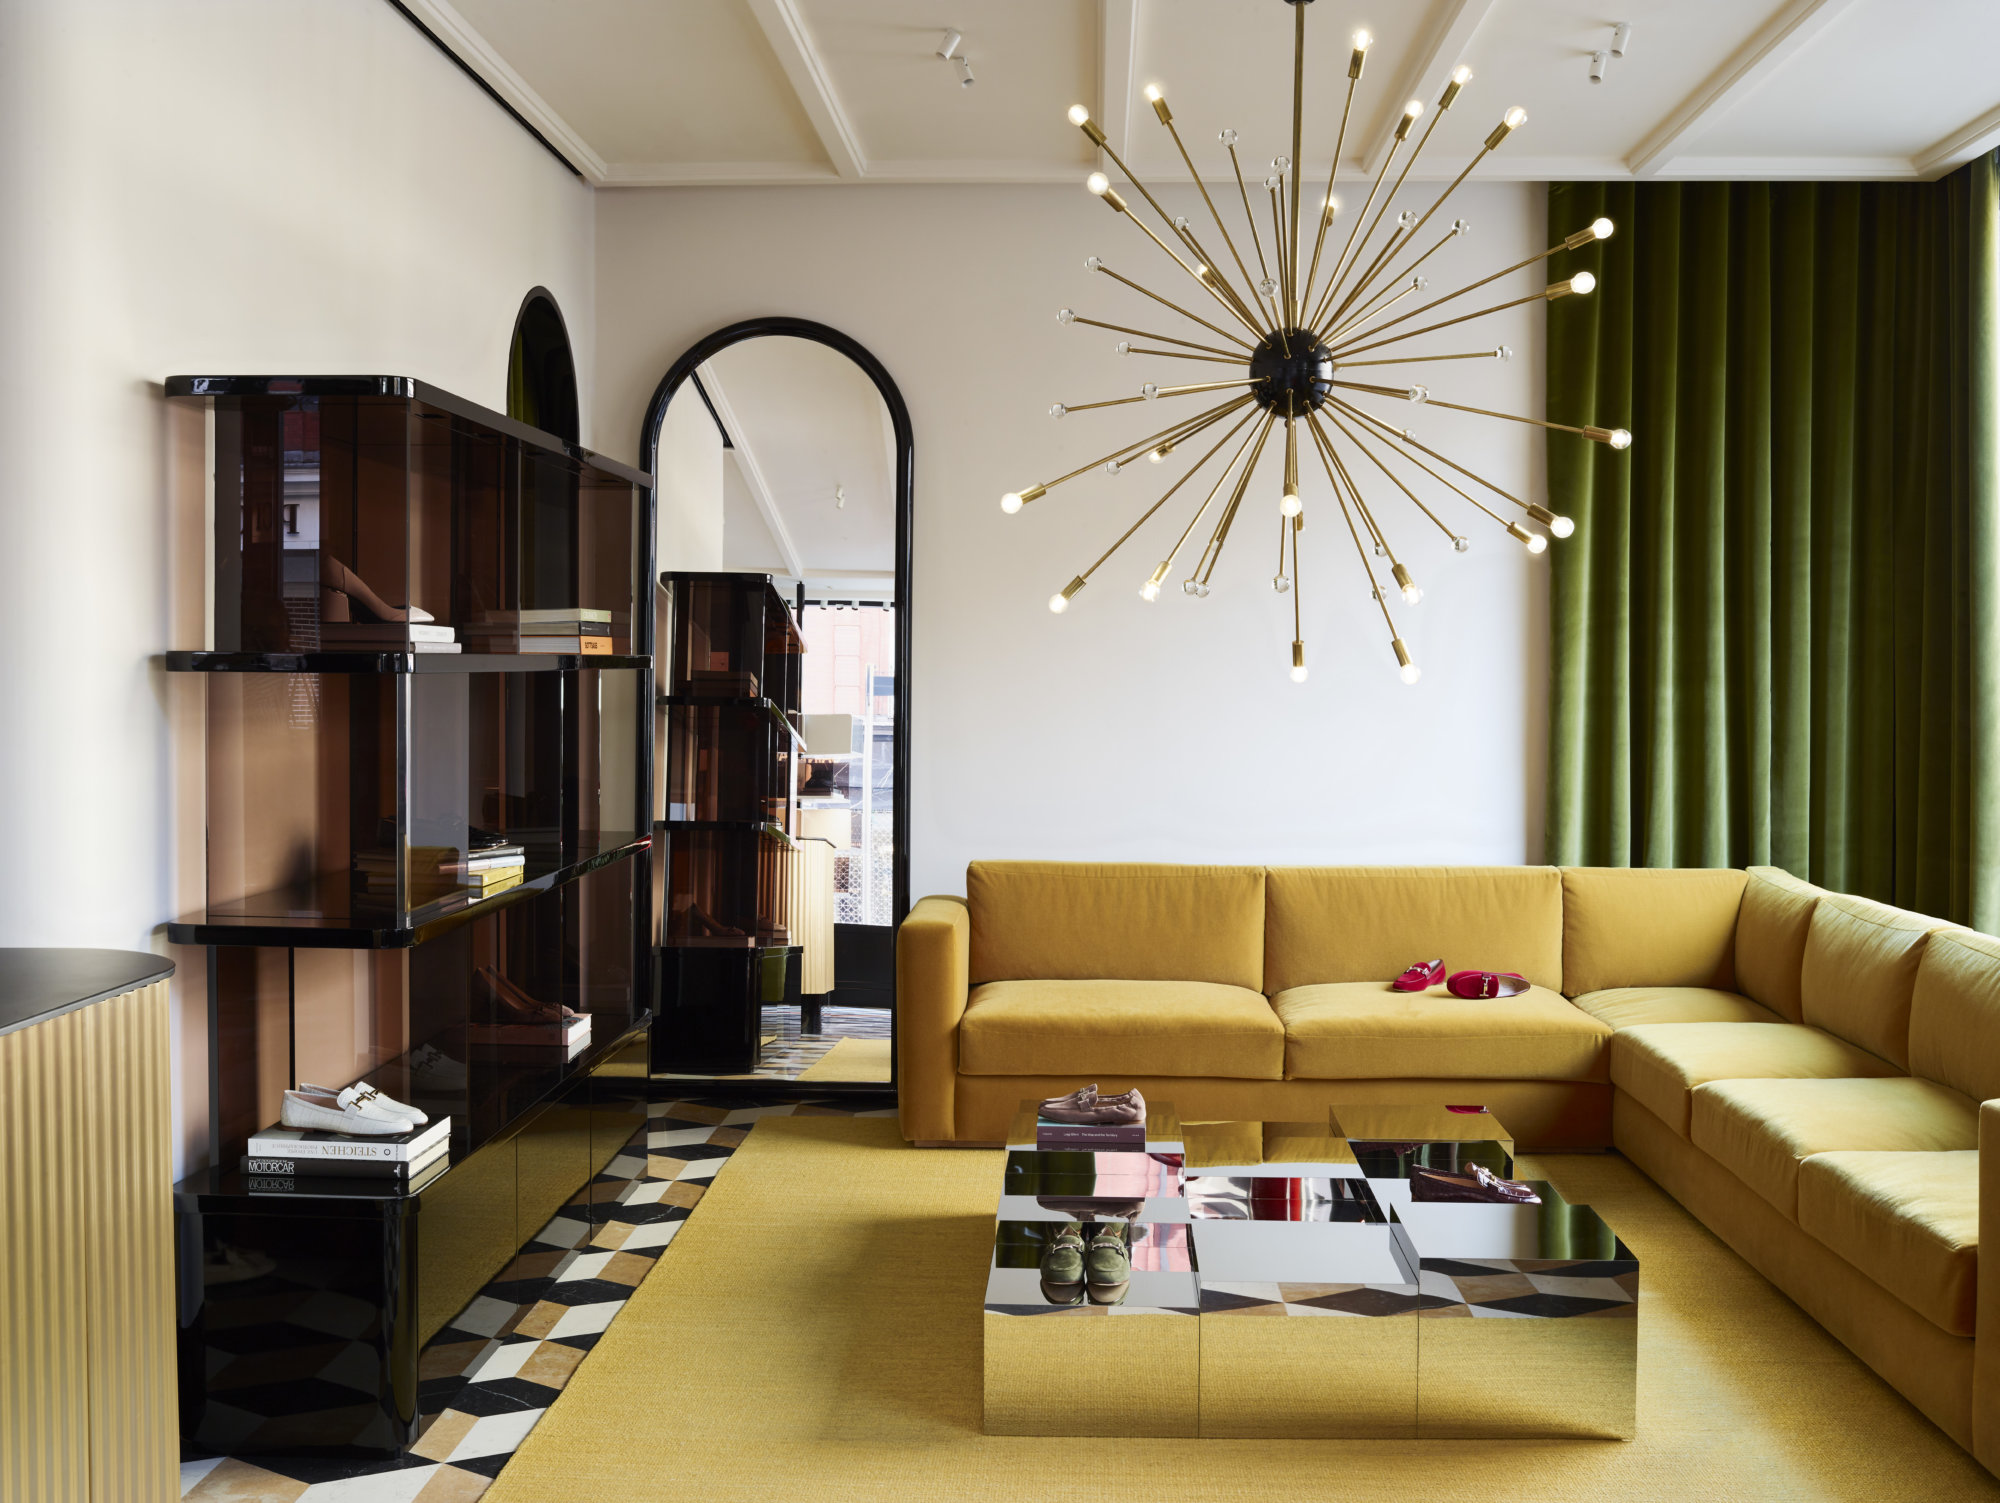 india_mahdavi_Tod's_2016_retail_London_architecture_design_interior_8-2000x1503.jpg